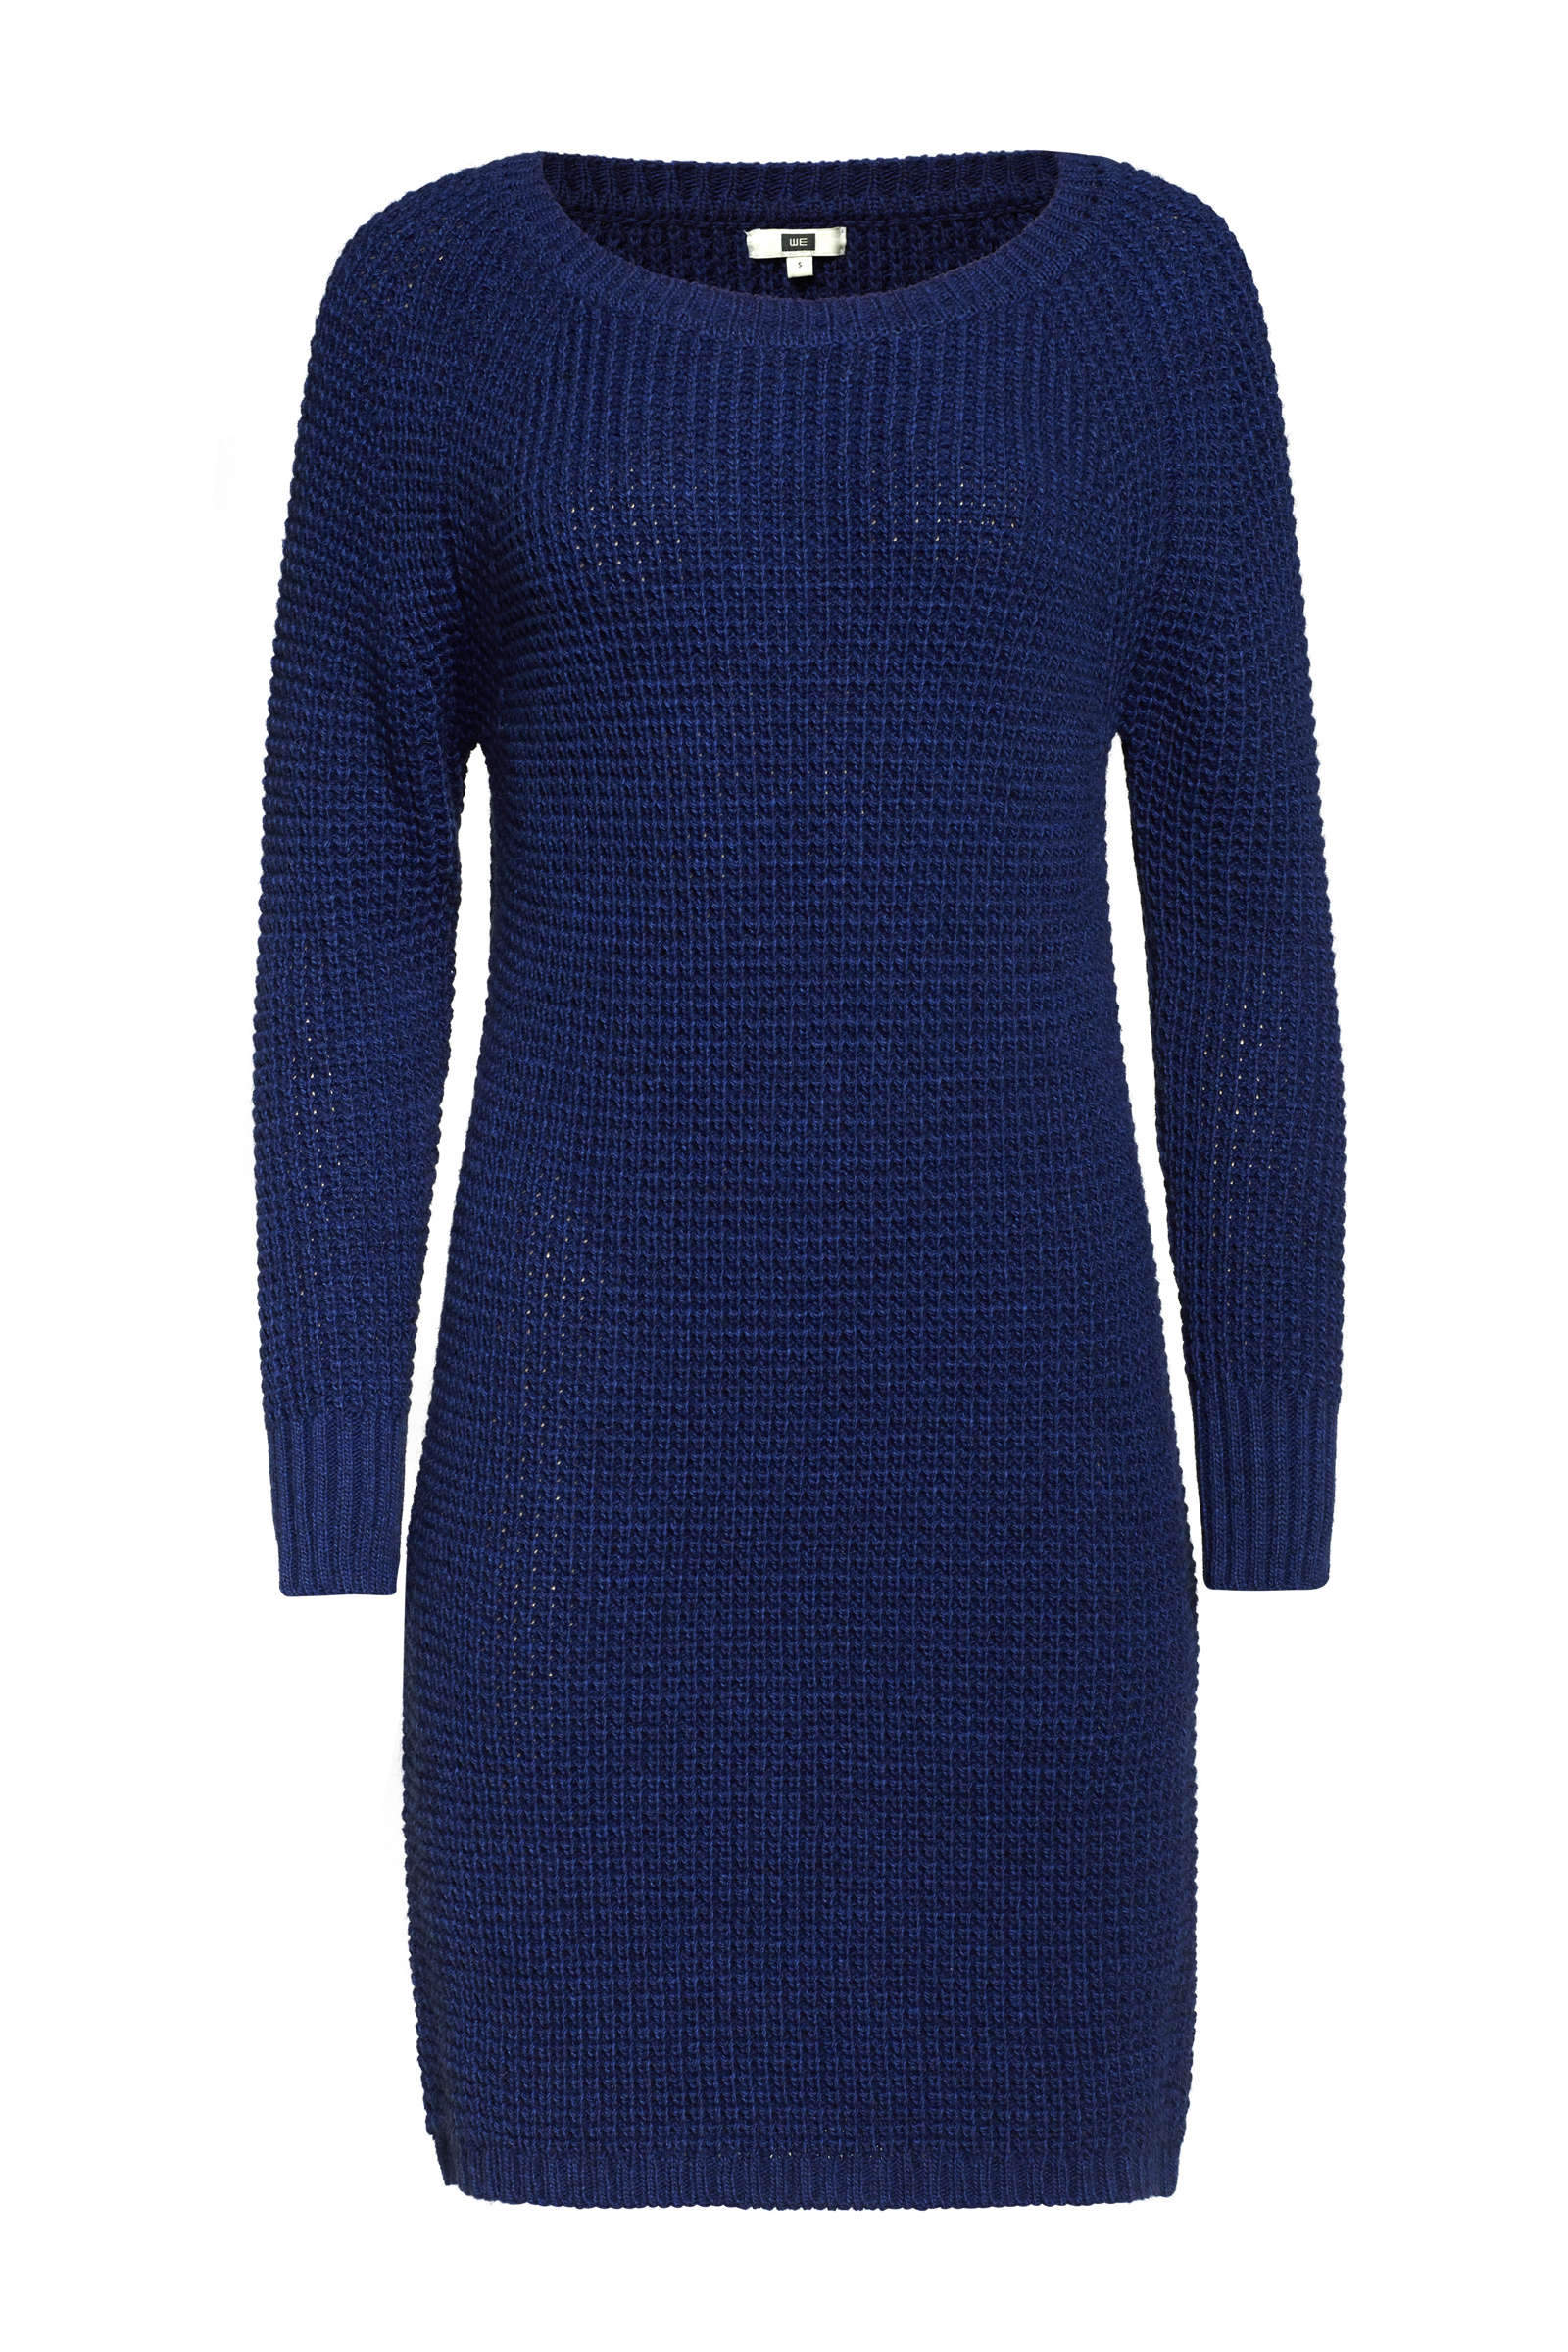 Dames gebreide trui jurk | 94953404 WE Fashion